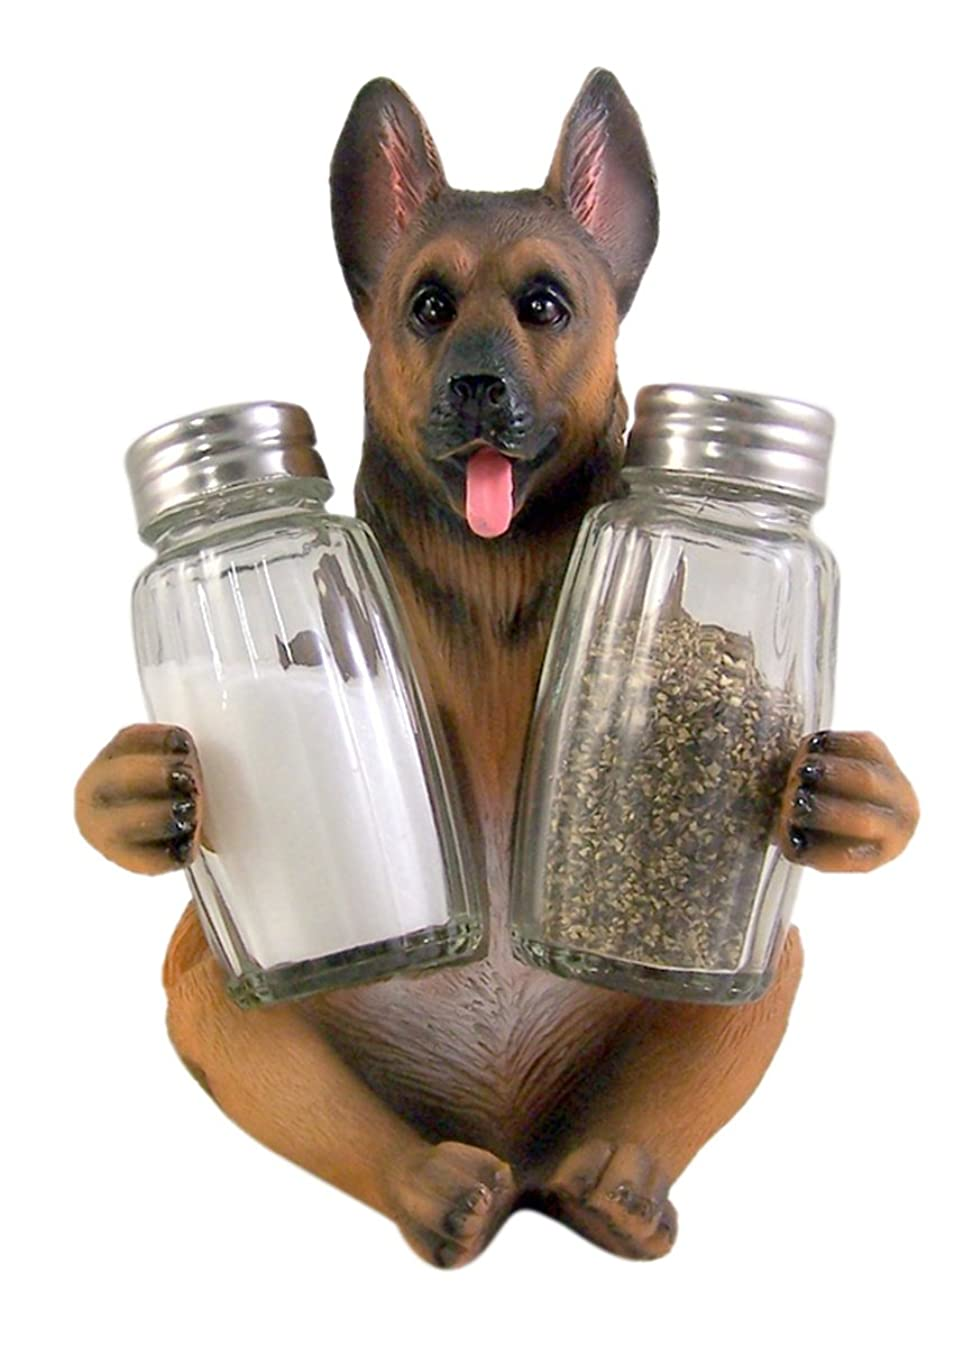 German Shepherd Salt and Pepper Shaker Holder 6 Inch (Shakers Included)